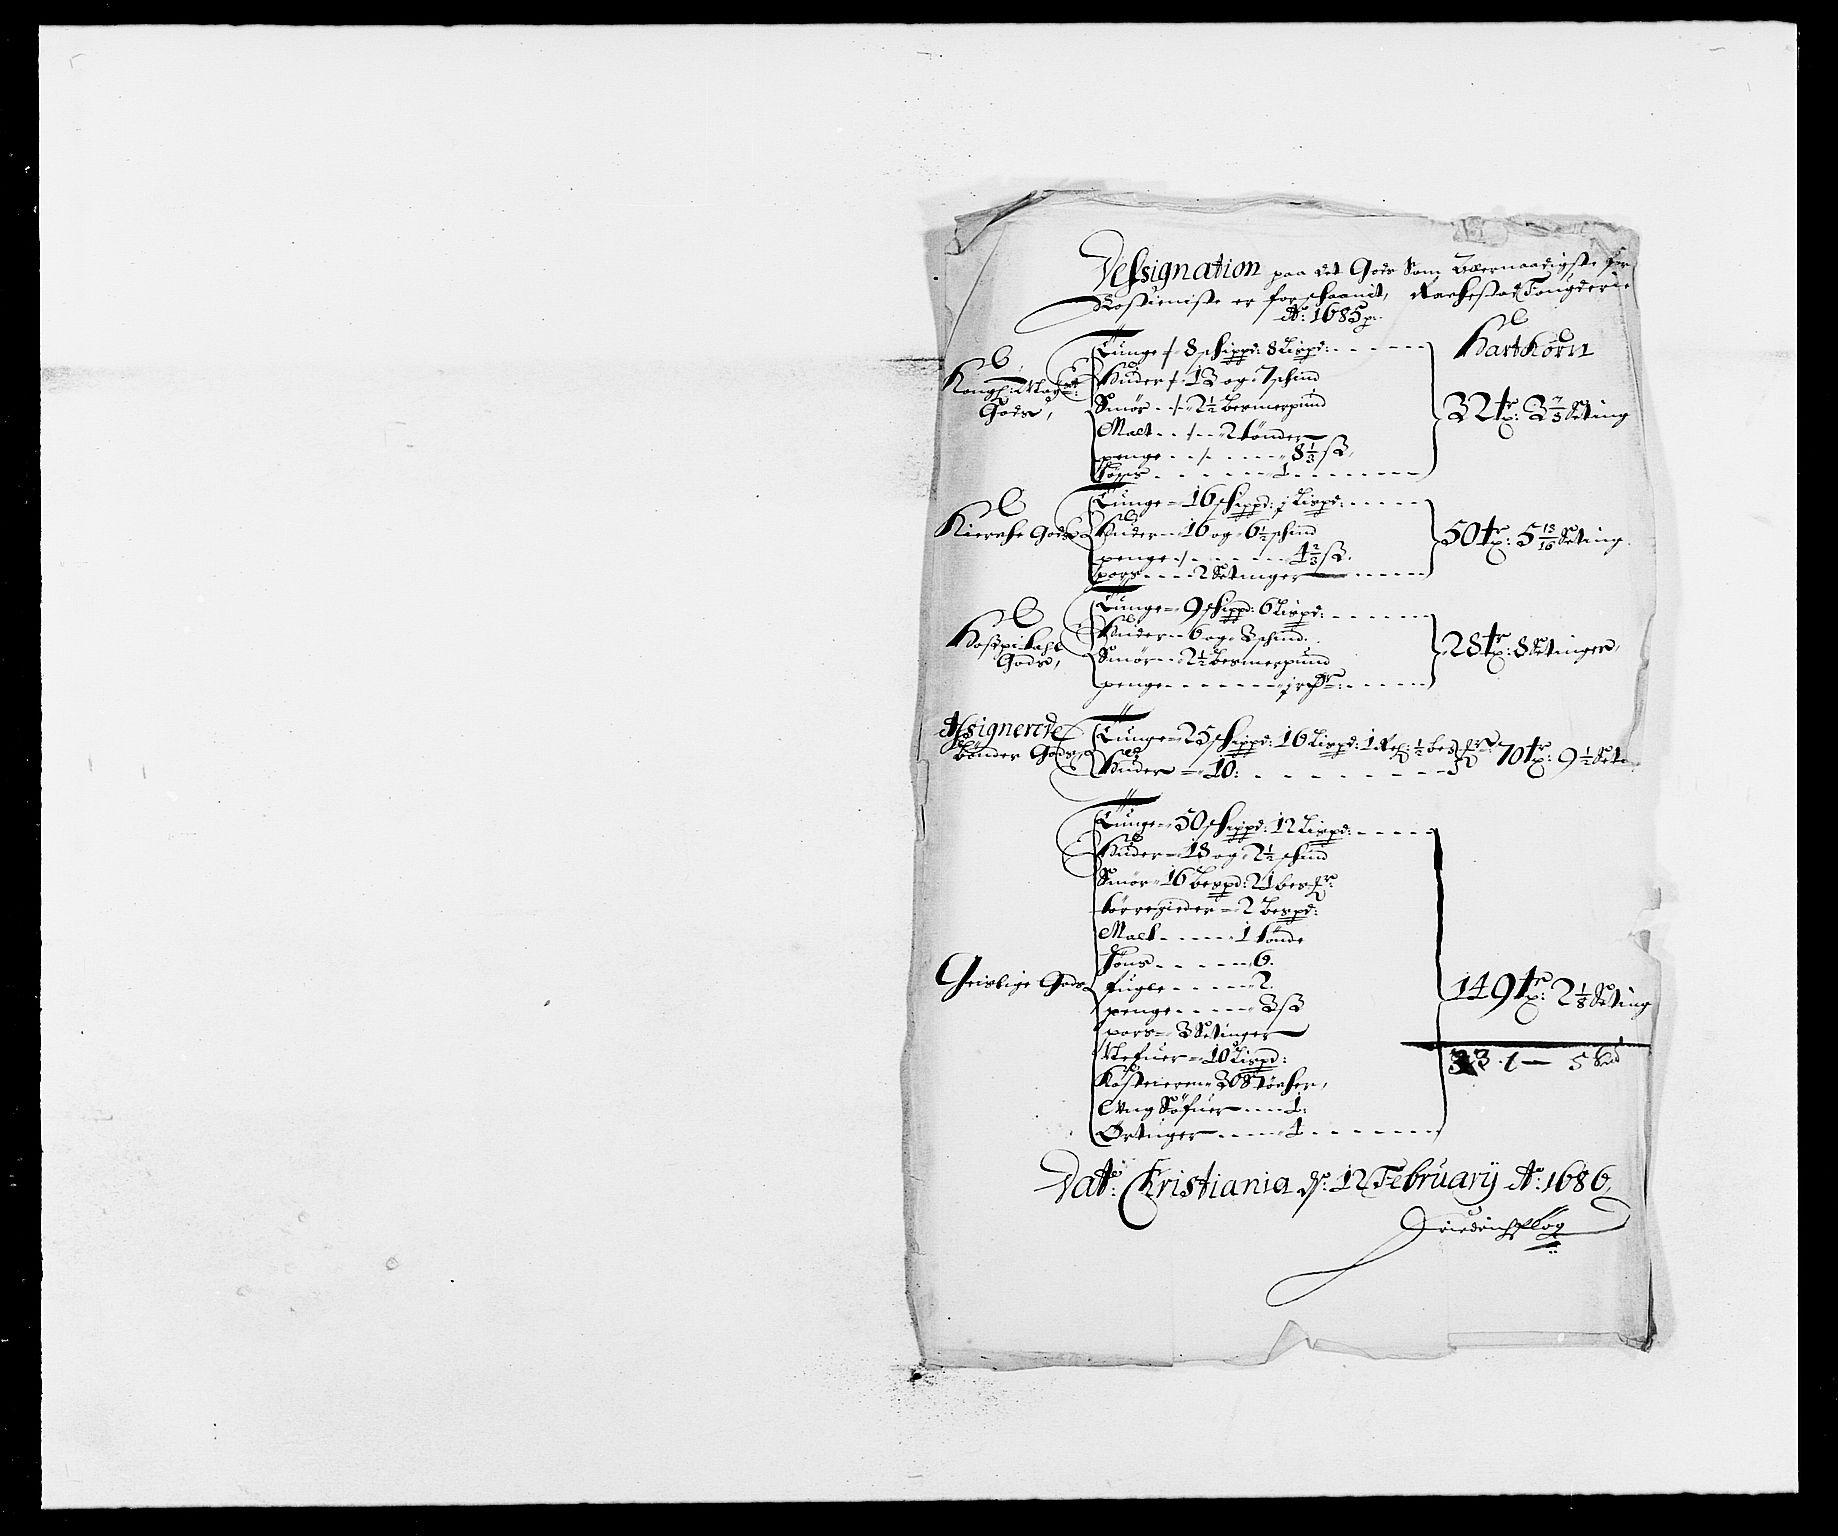 RA, Rentekammeret inntil 1814, Reviderte regnskaper, Fogderegnskap, R05/L0275: Fogderegnskap Rakkestad, 1685-1686, s. 135